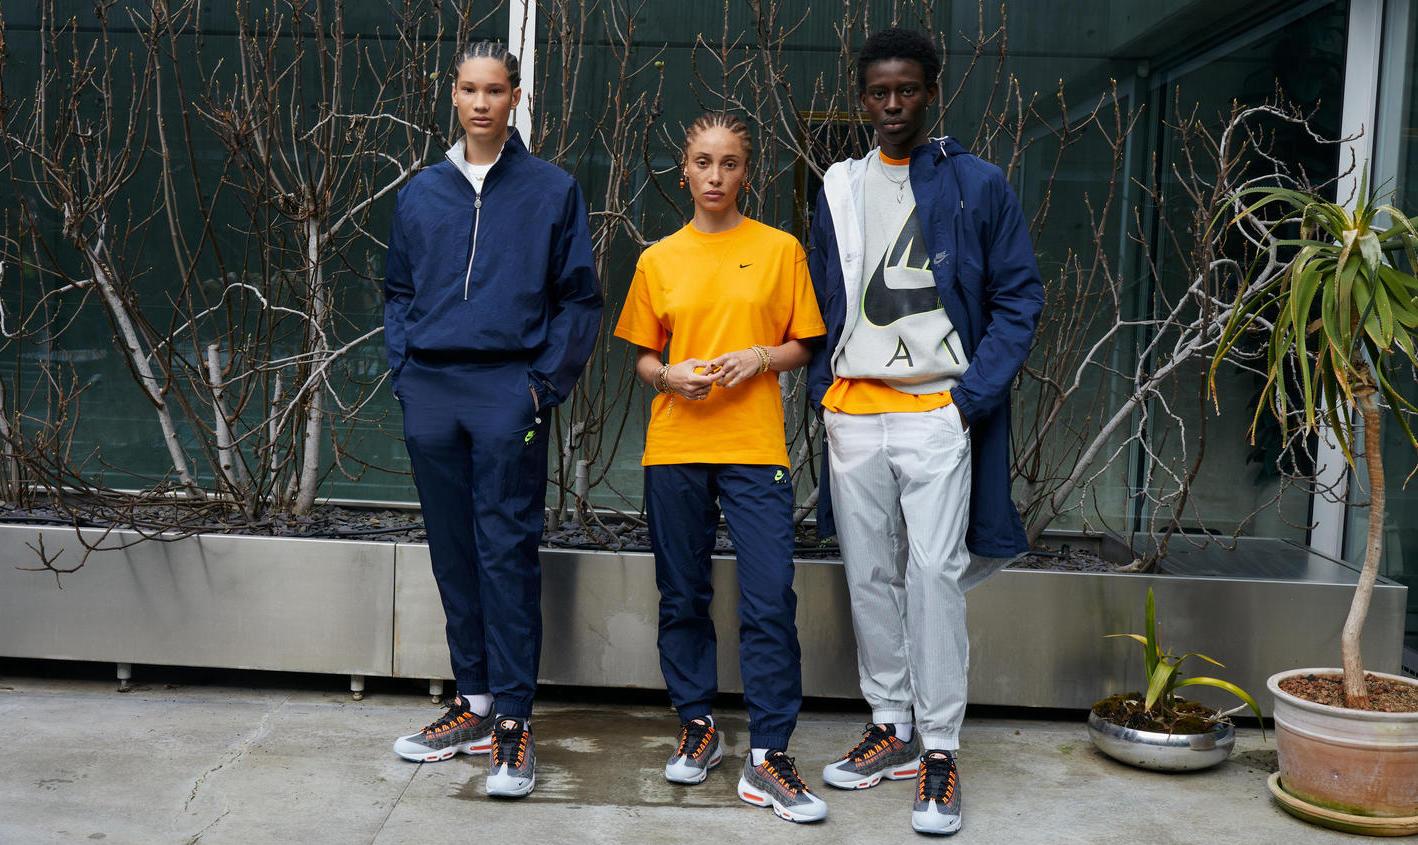 Nike×キム・ジョーンズに新作 マックス エア強調したコレクション発売